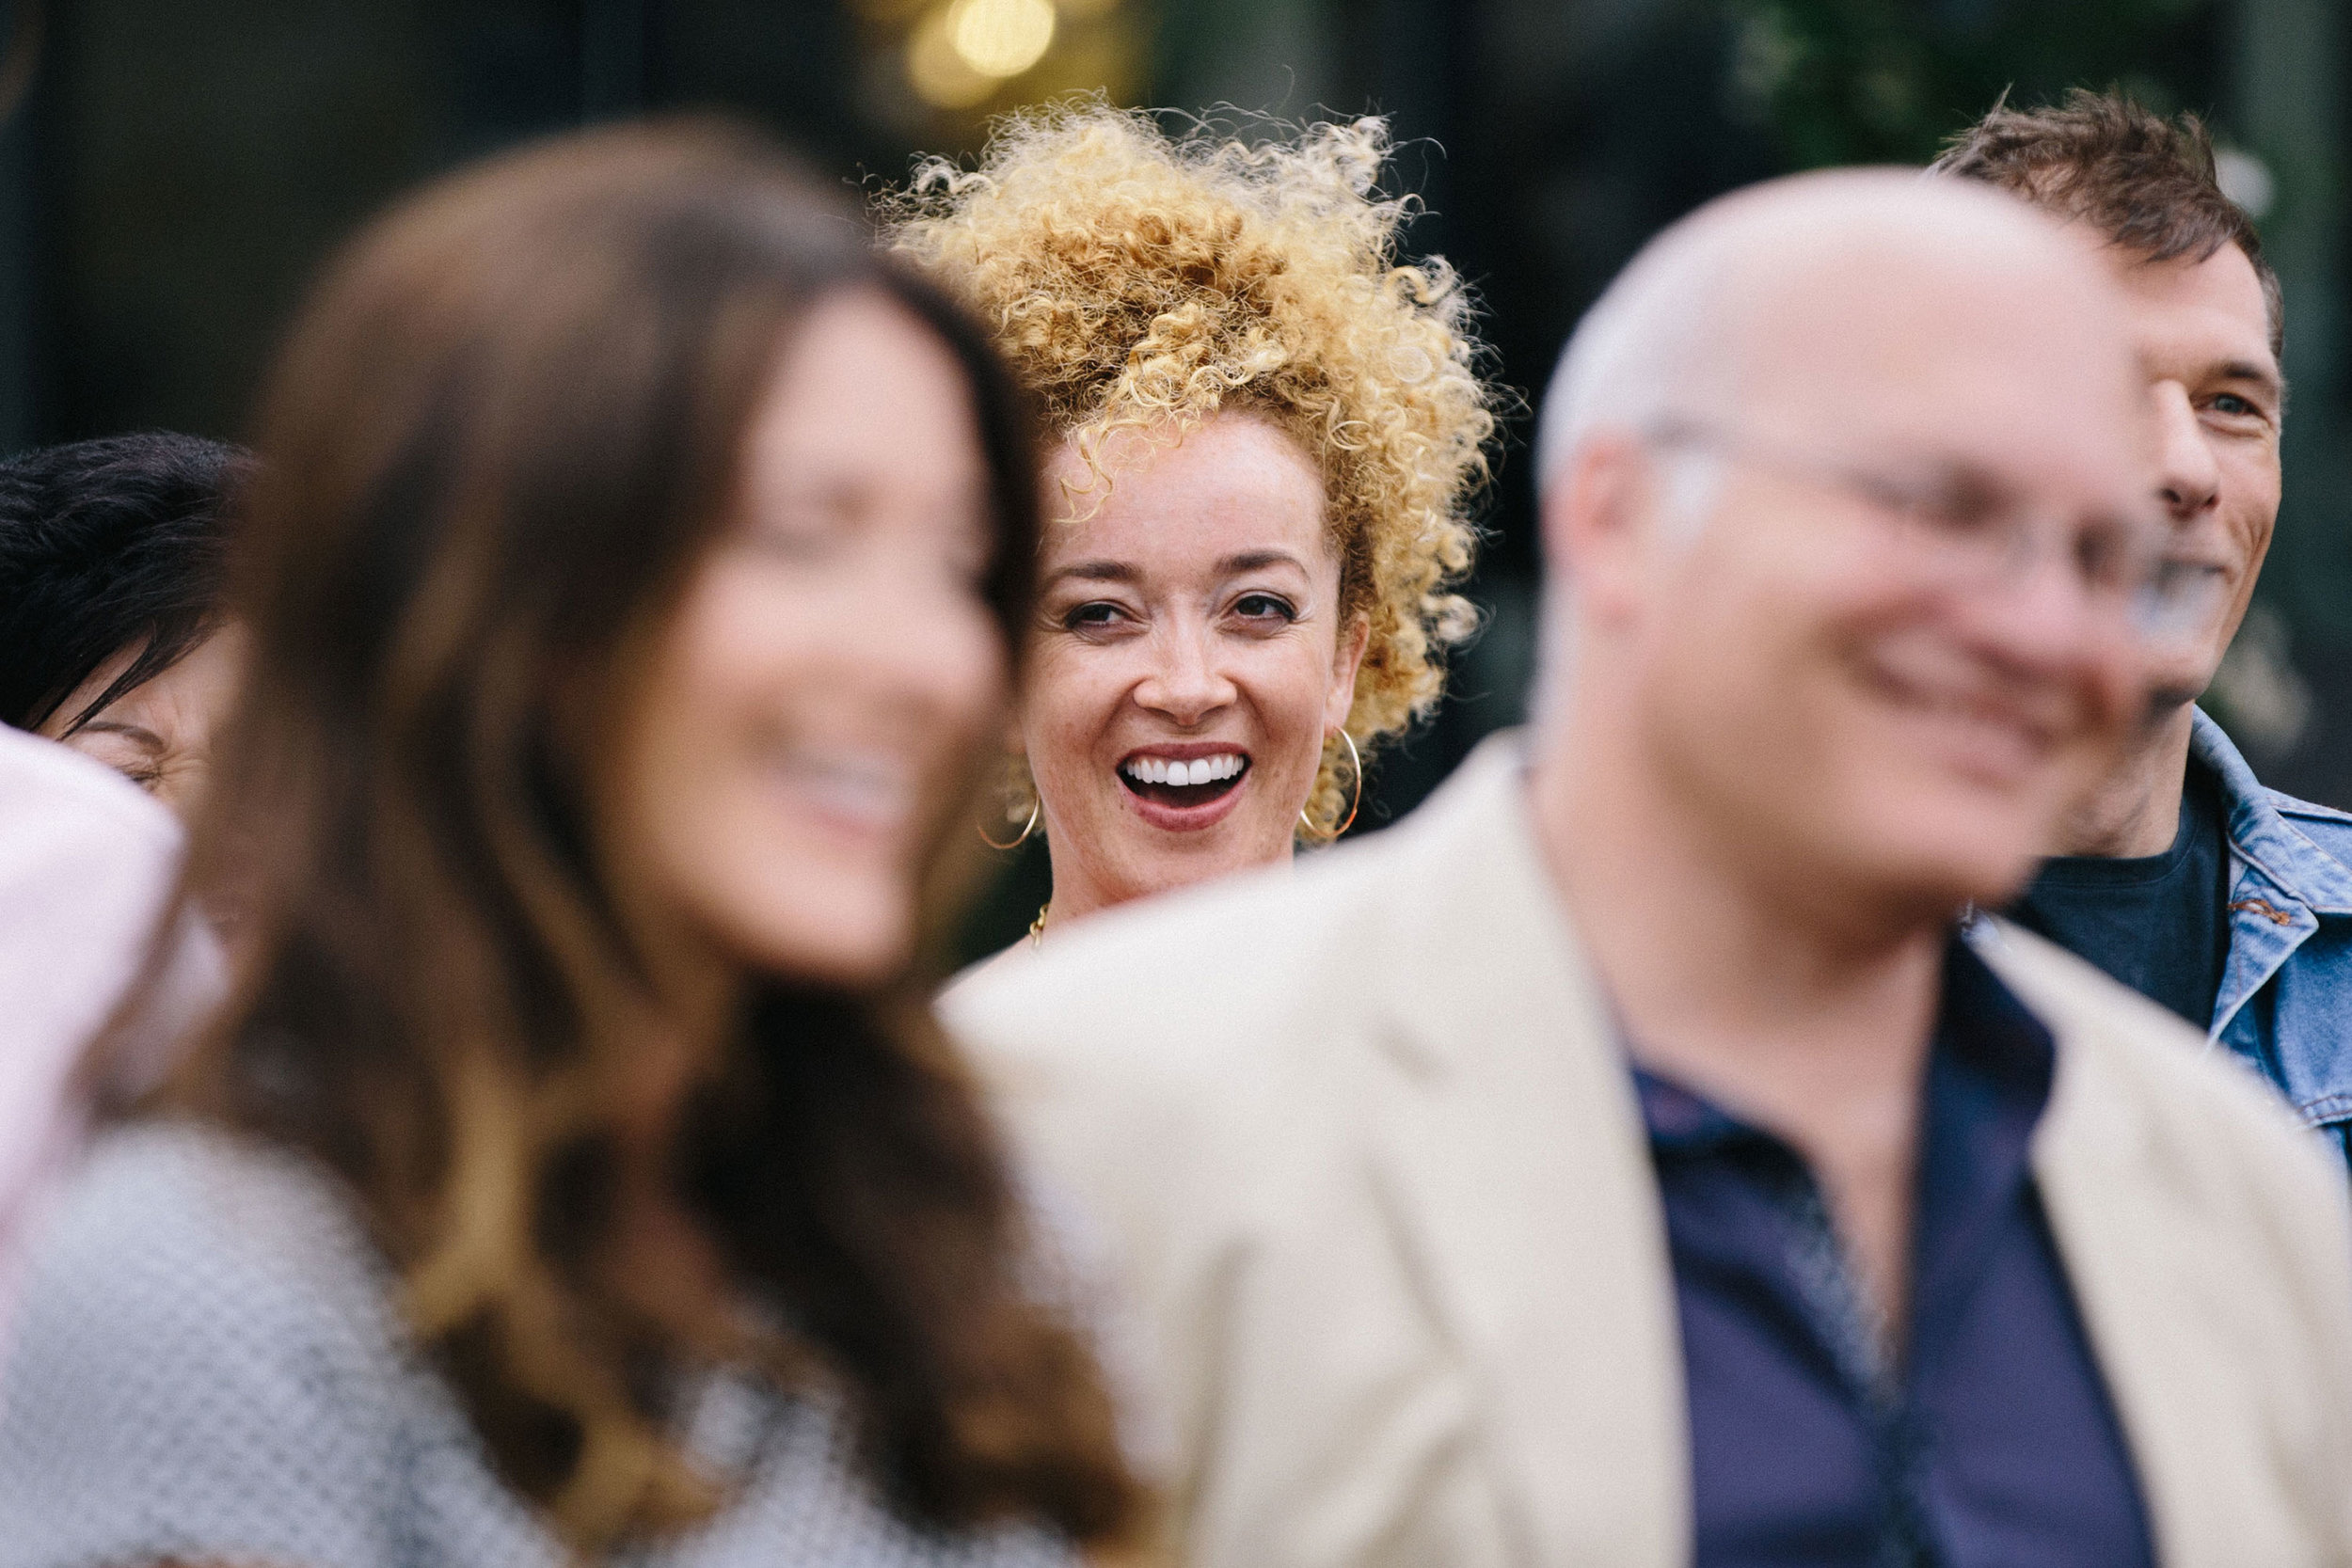 West-London-wedding-party-in-Ladbroke-Grove-Michael-Newington-Gray-43.jpg